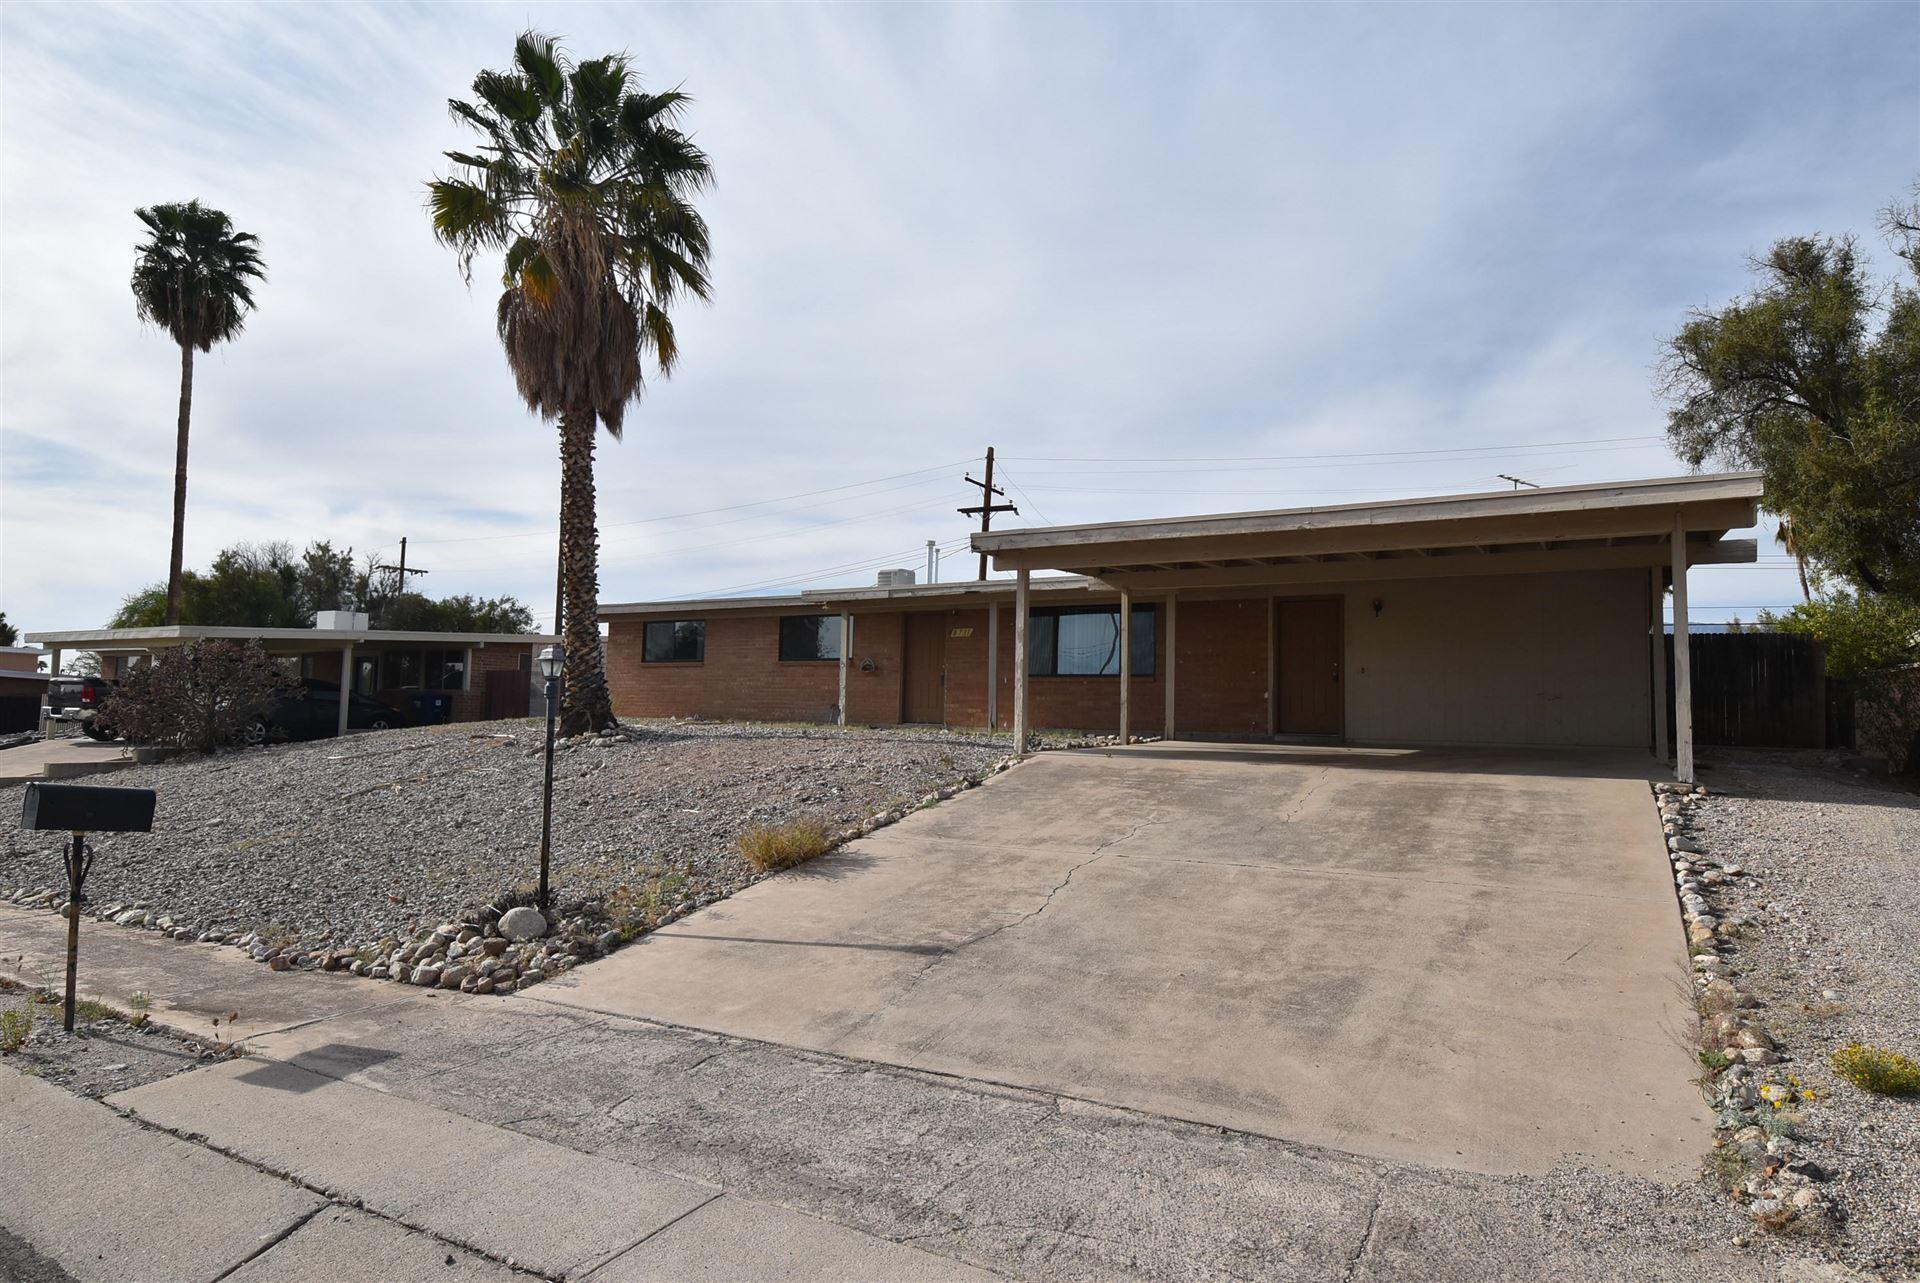 8731 E Colette Street, Tucson, AZ 85710 - MLS#: 22109985